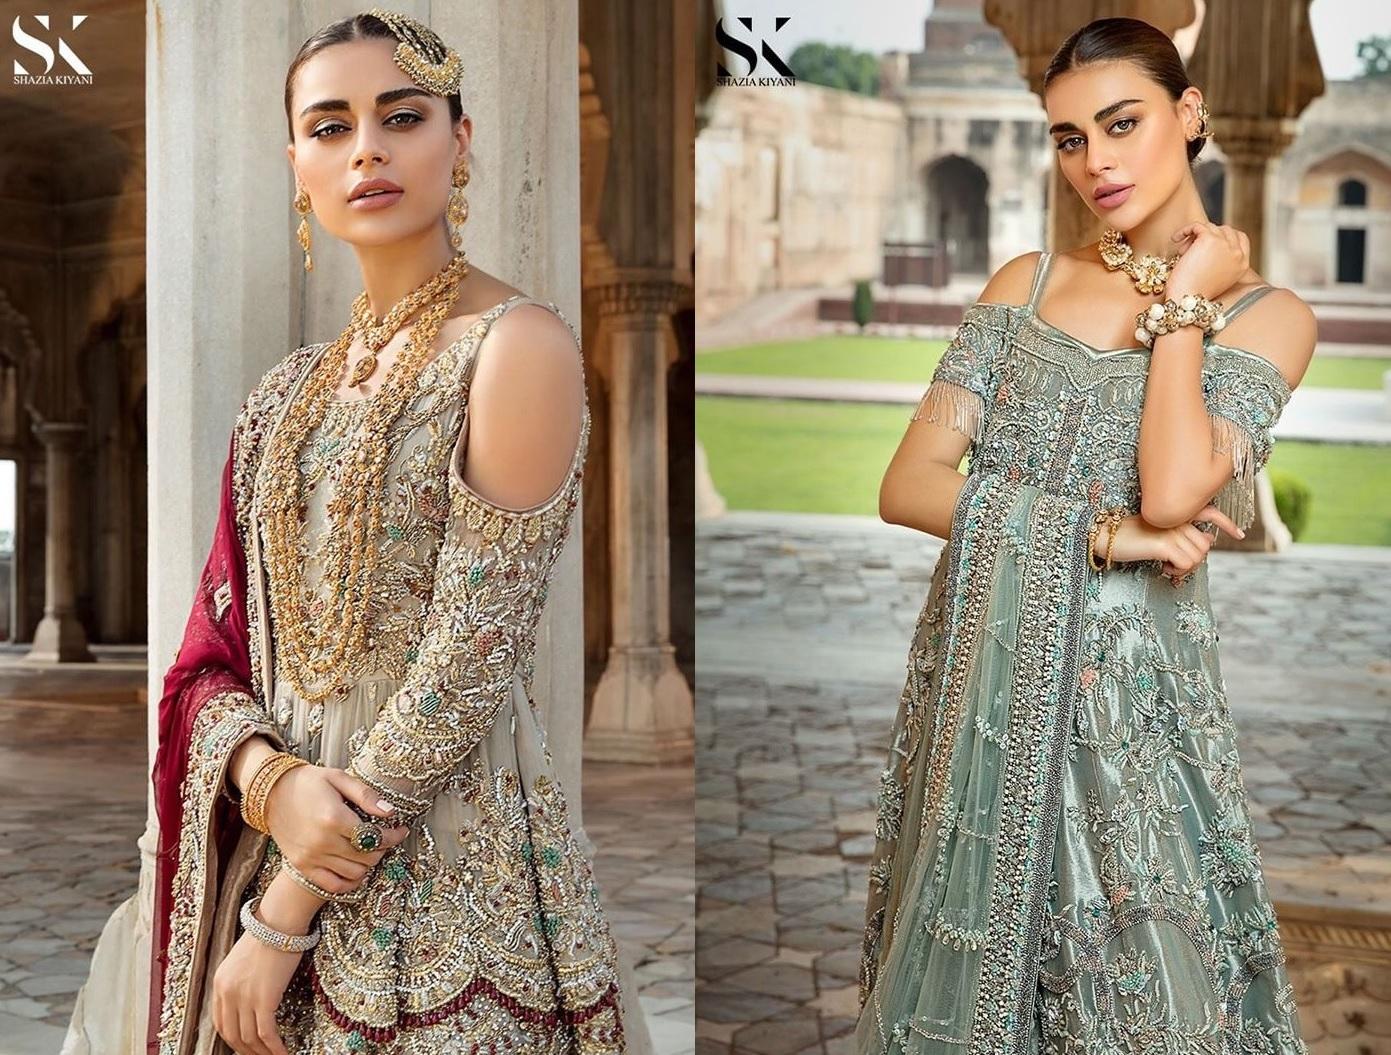 Fashion Model Sadaf Kanwal Latest Photo Shoot (1)